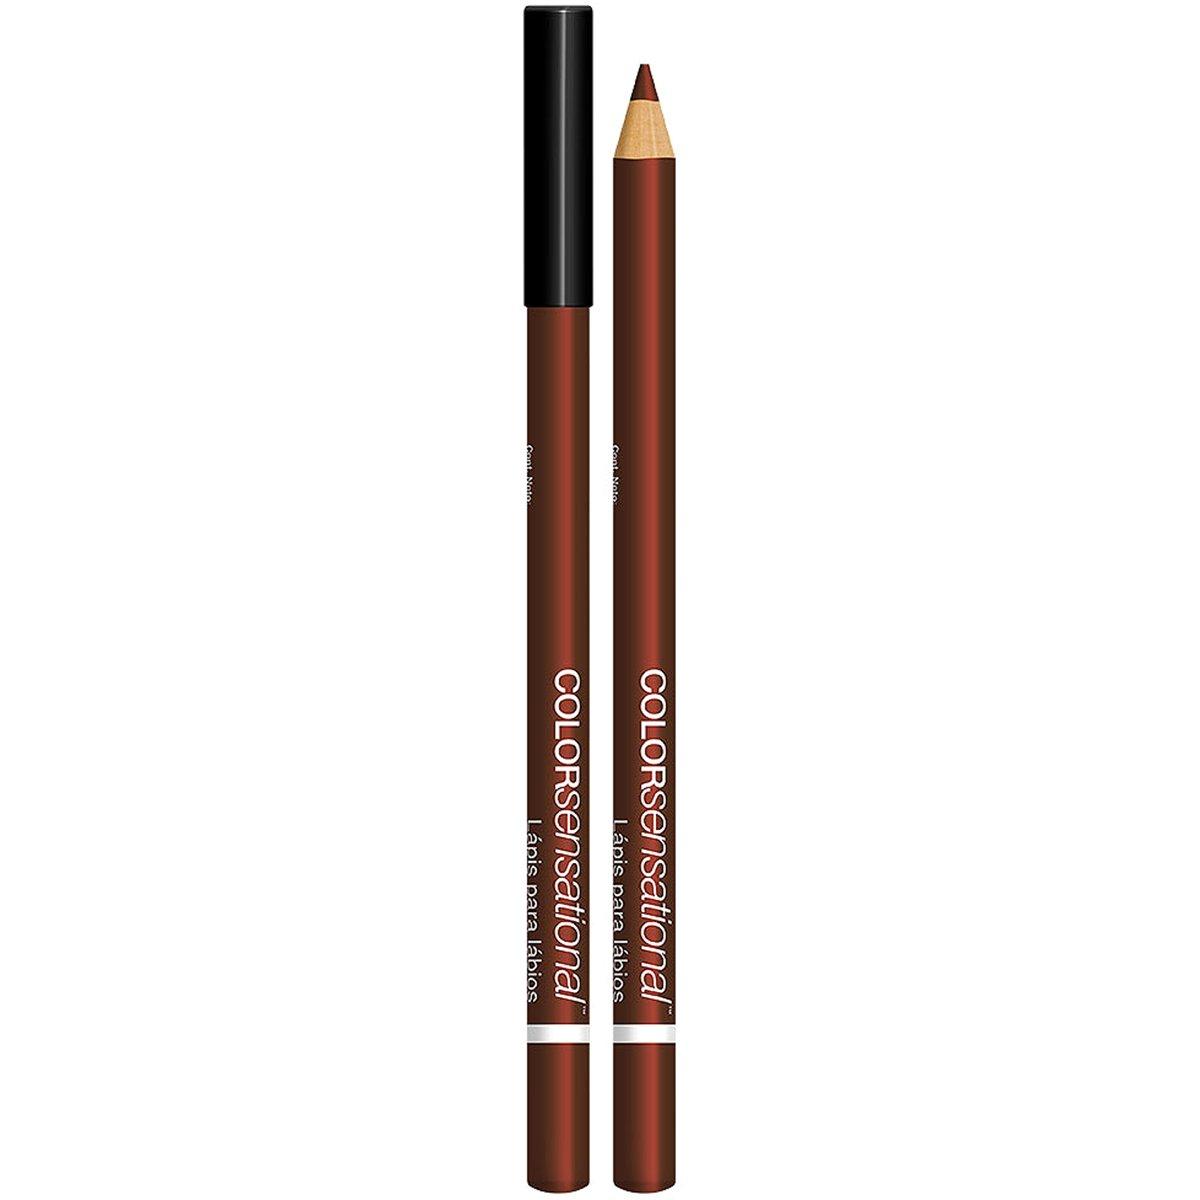 Lápis Labial Maybelline Color Sensational Cor 210 Sorte No Jogo - Incolor